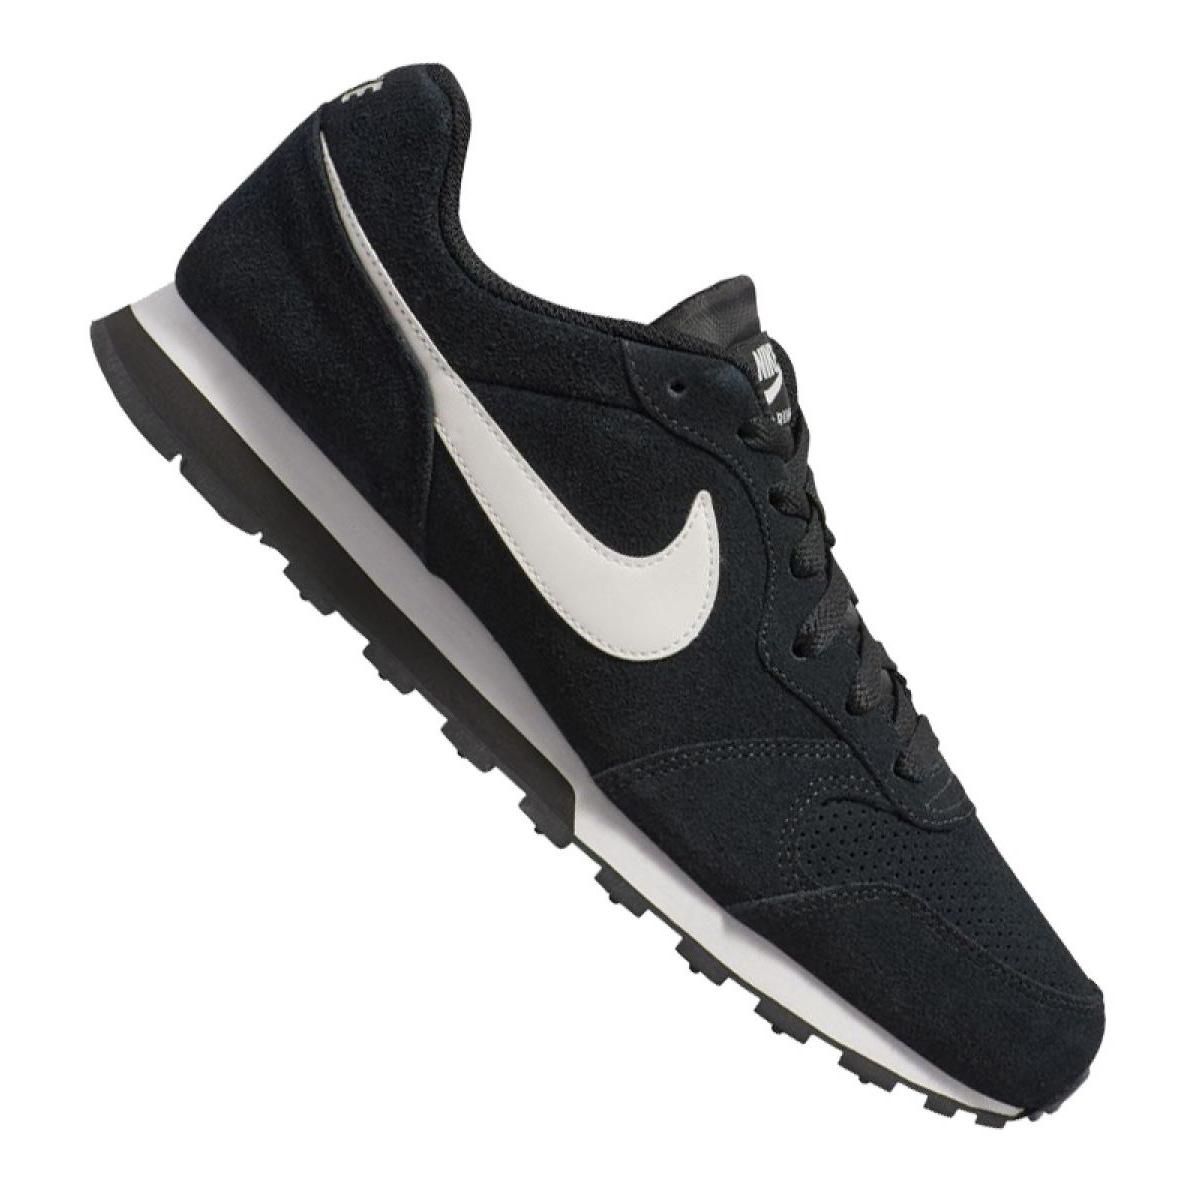 Zapatillas Nike Md Runner 2 Suede M AQ9211 004 negro